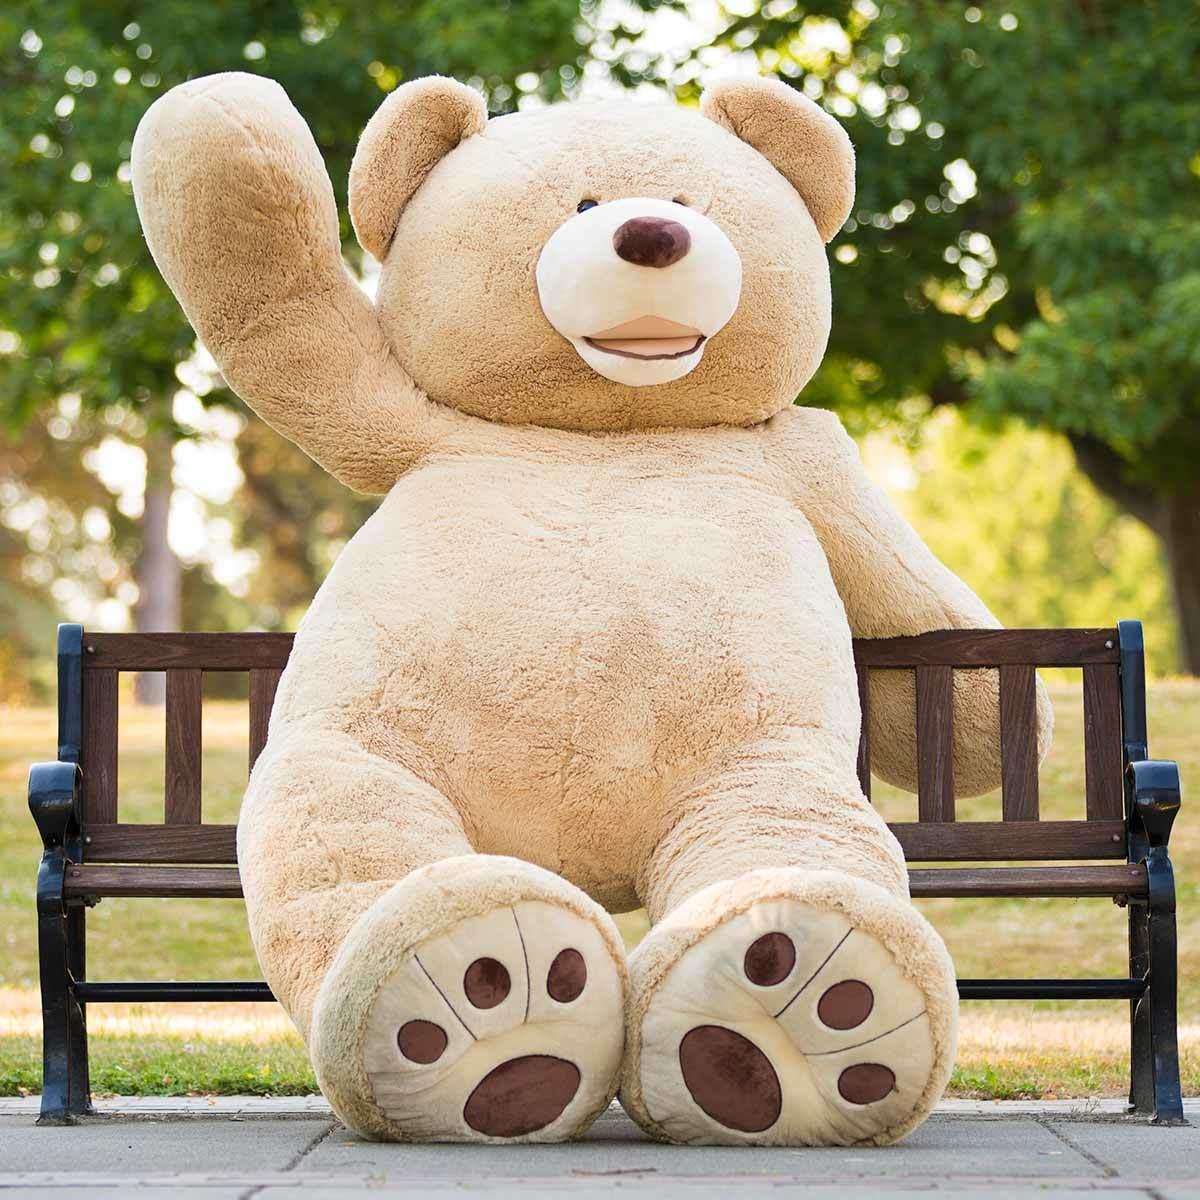 Blue Big Teddy Bear, Hugfun 93 236cm Plush Sitting Bear 3 Years Costco Uk